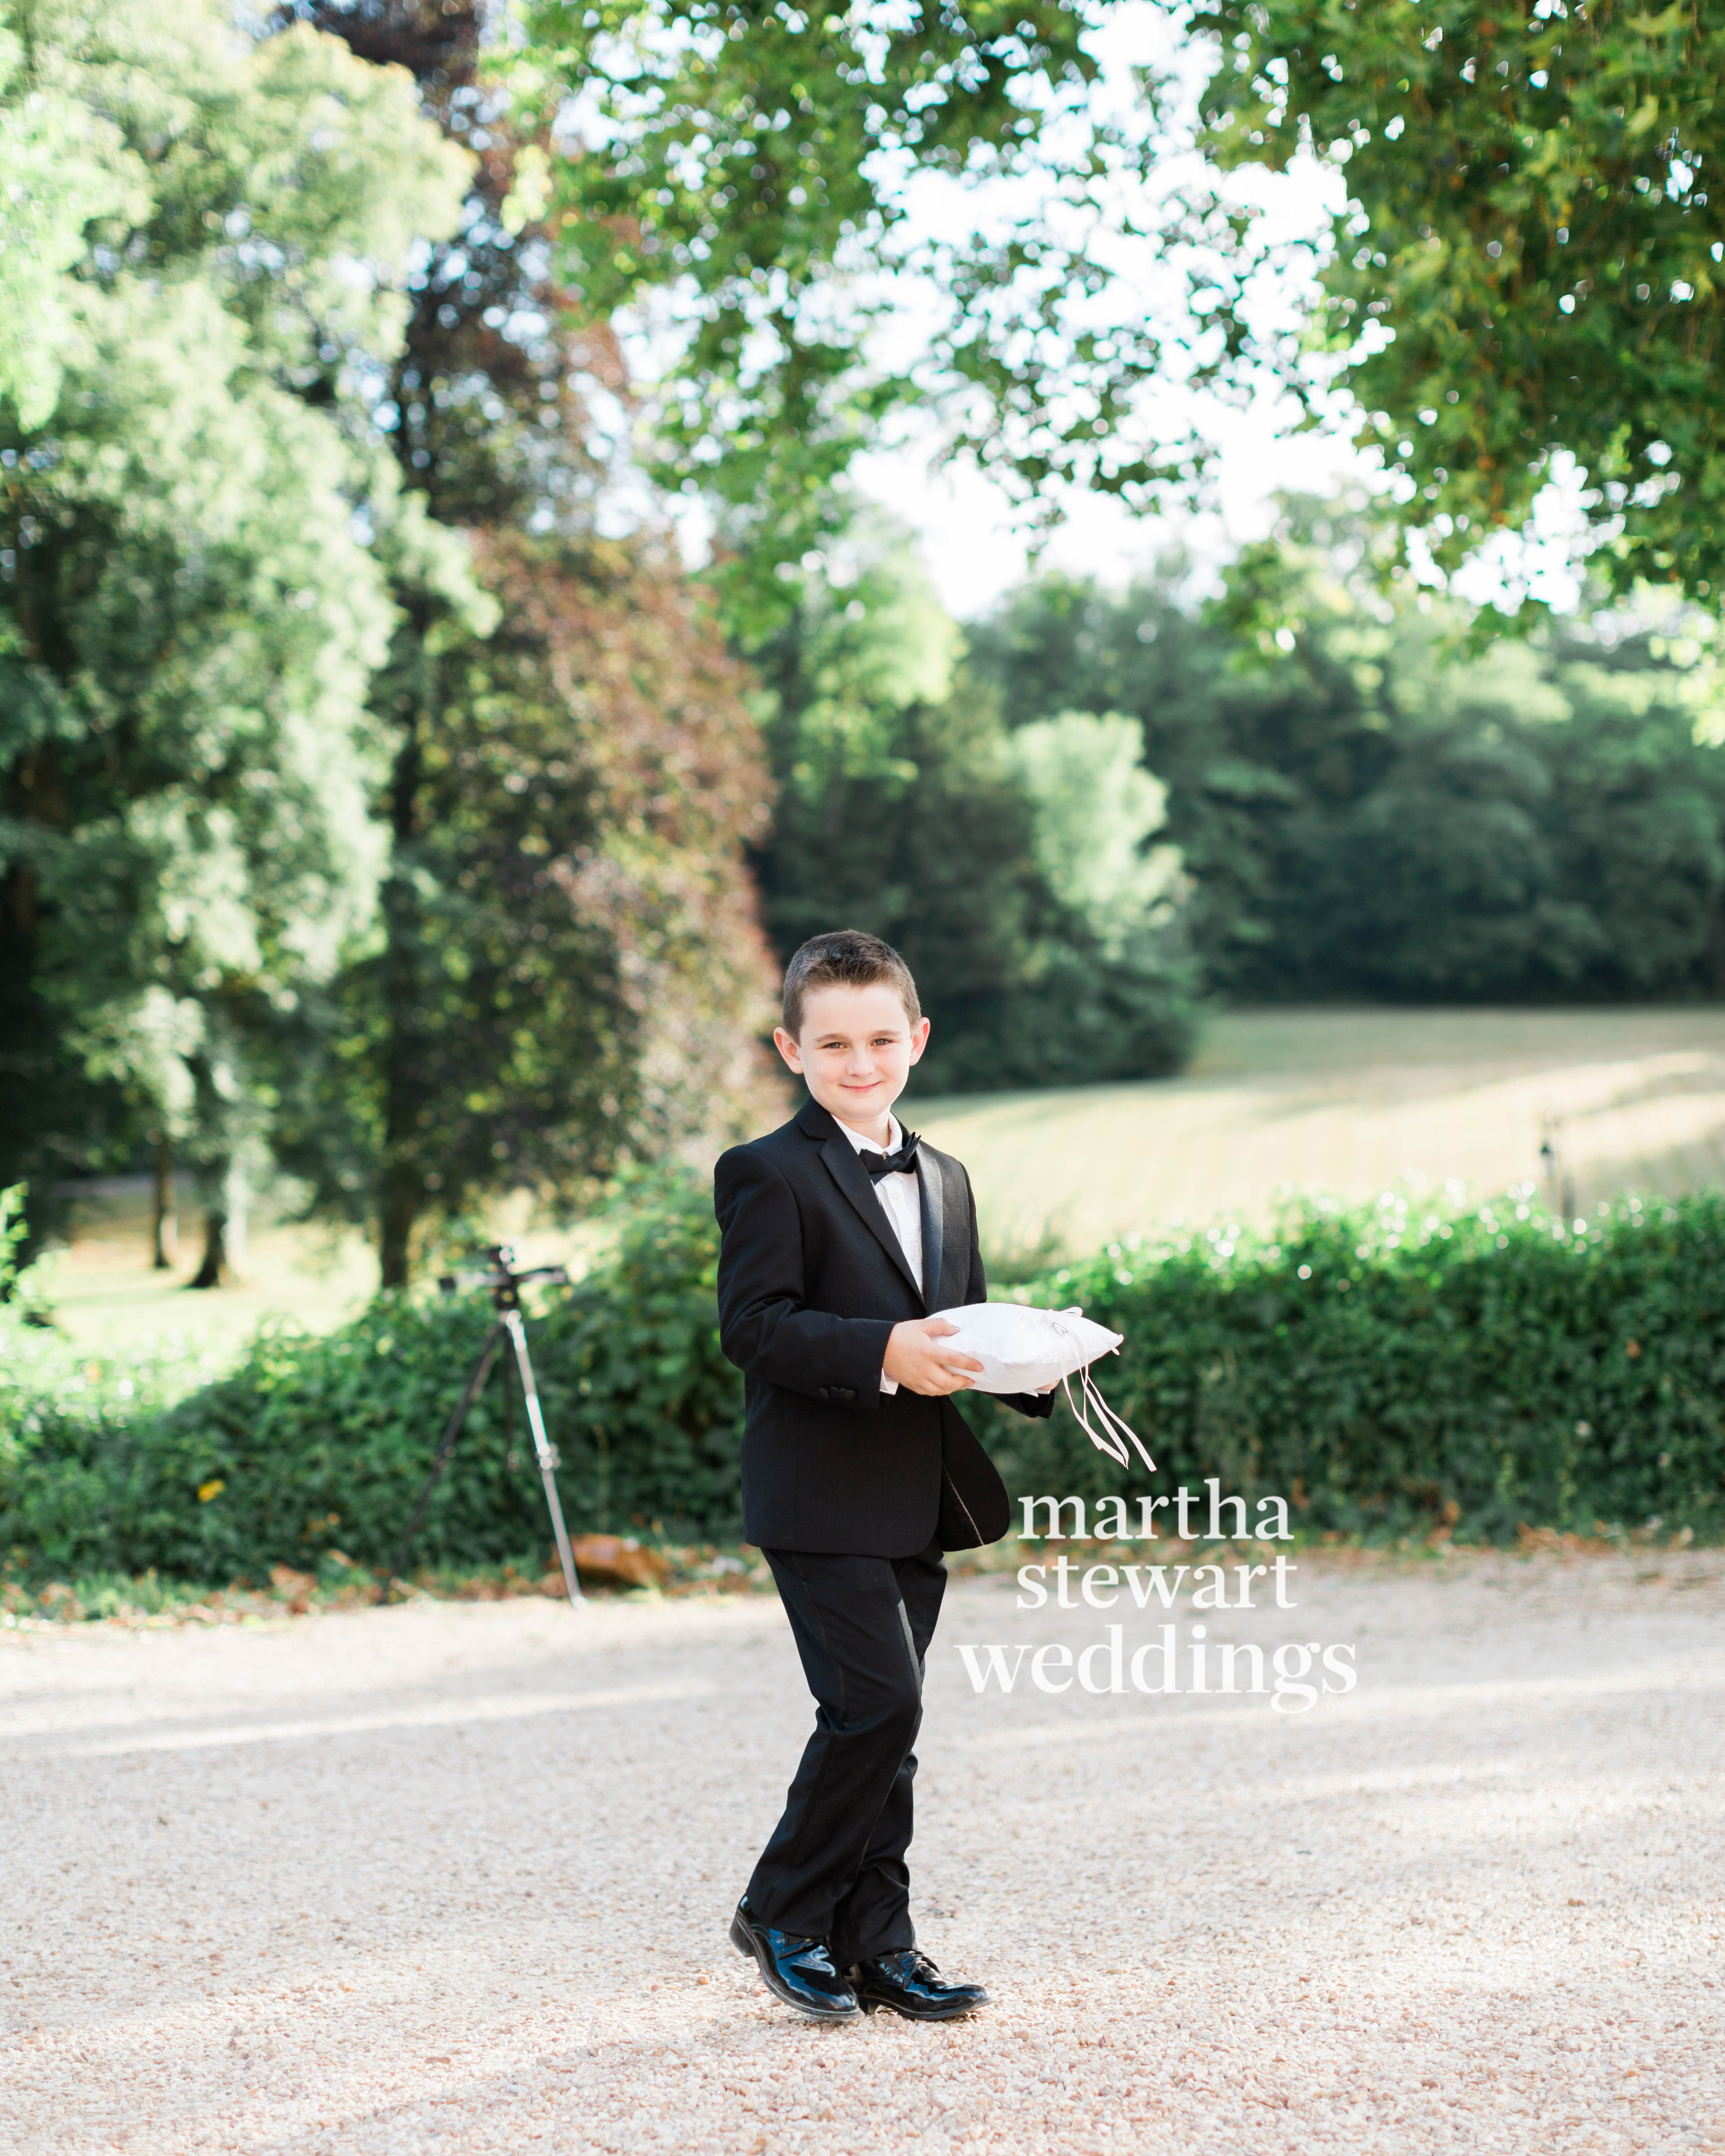 jenny-freddie-wedding-france-505-d112242-watermarked-1215.jpg